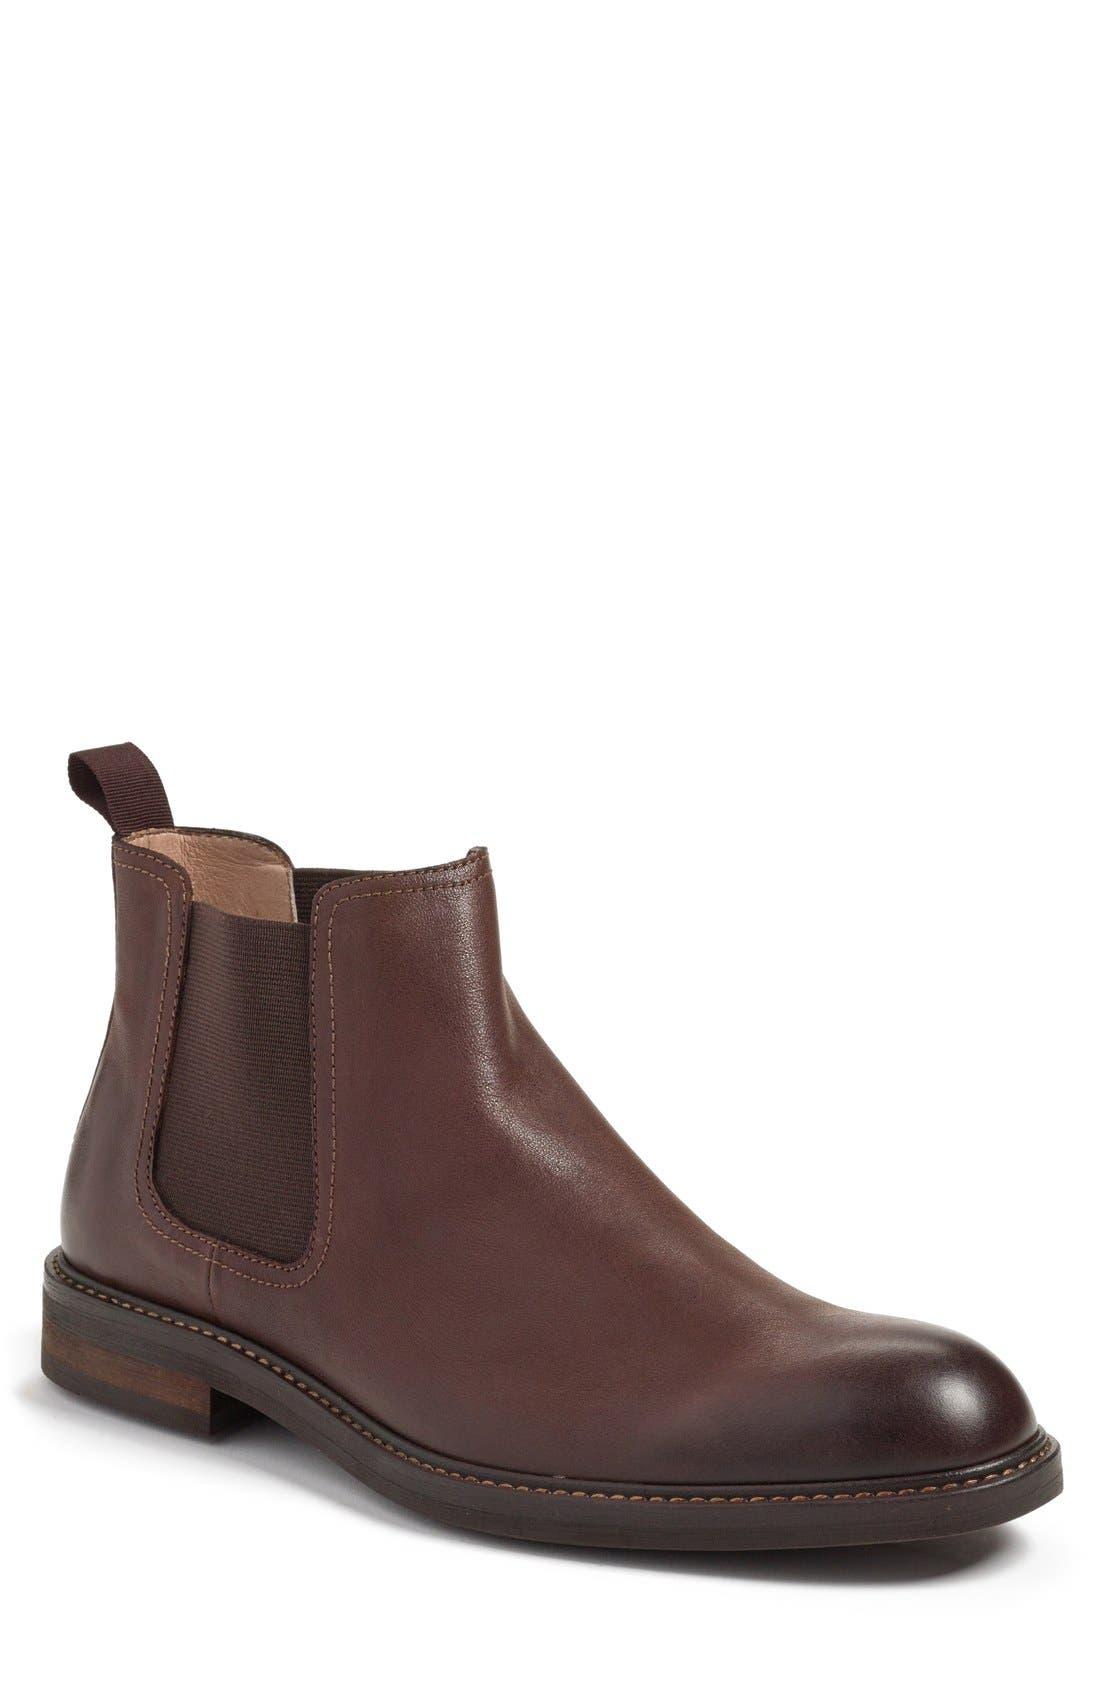 Horton Chelsea Boot,                             Main thumbnail 5, color,